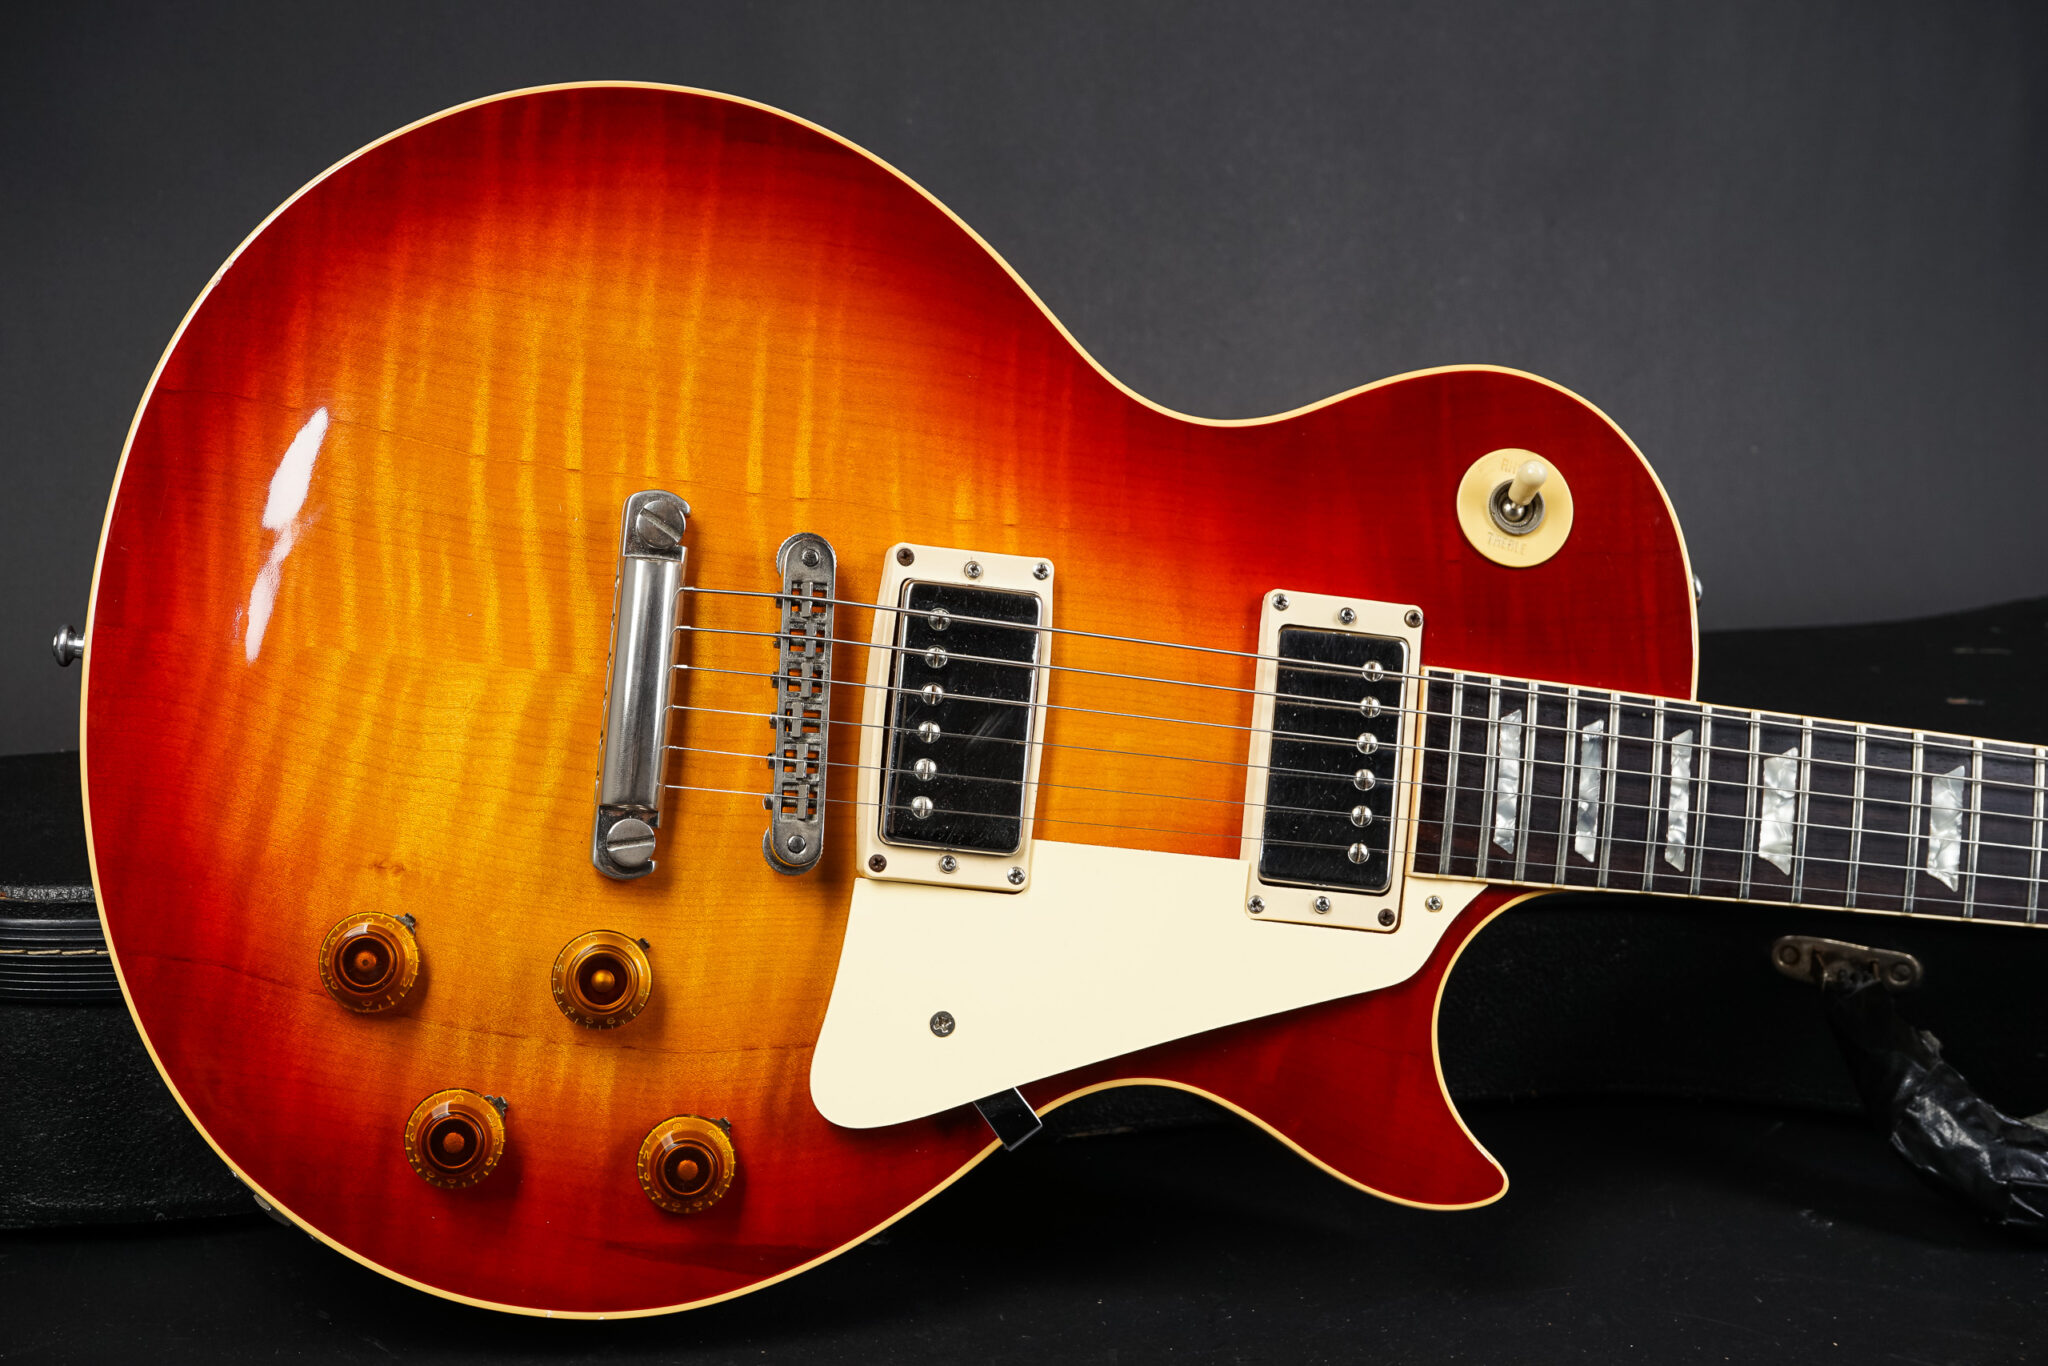 https://guitarpoint.de/app/uploads/products/1980-gibson-les-paul-heritage-80-sunburst-flametop/1980-Gibson-Les-Paul-Heritage-80-Sunburst-087-9-2048x1366.jpg